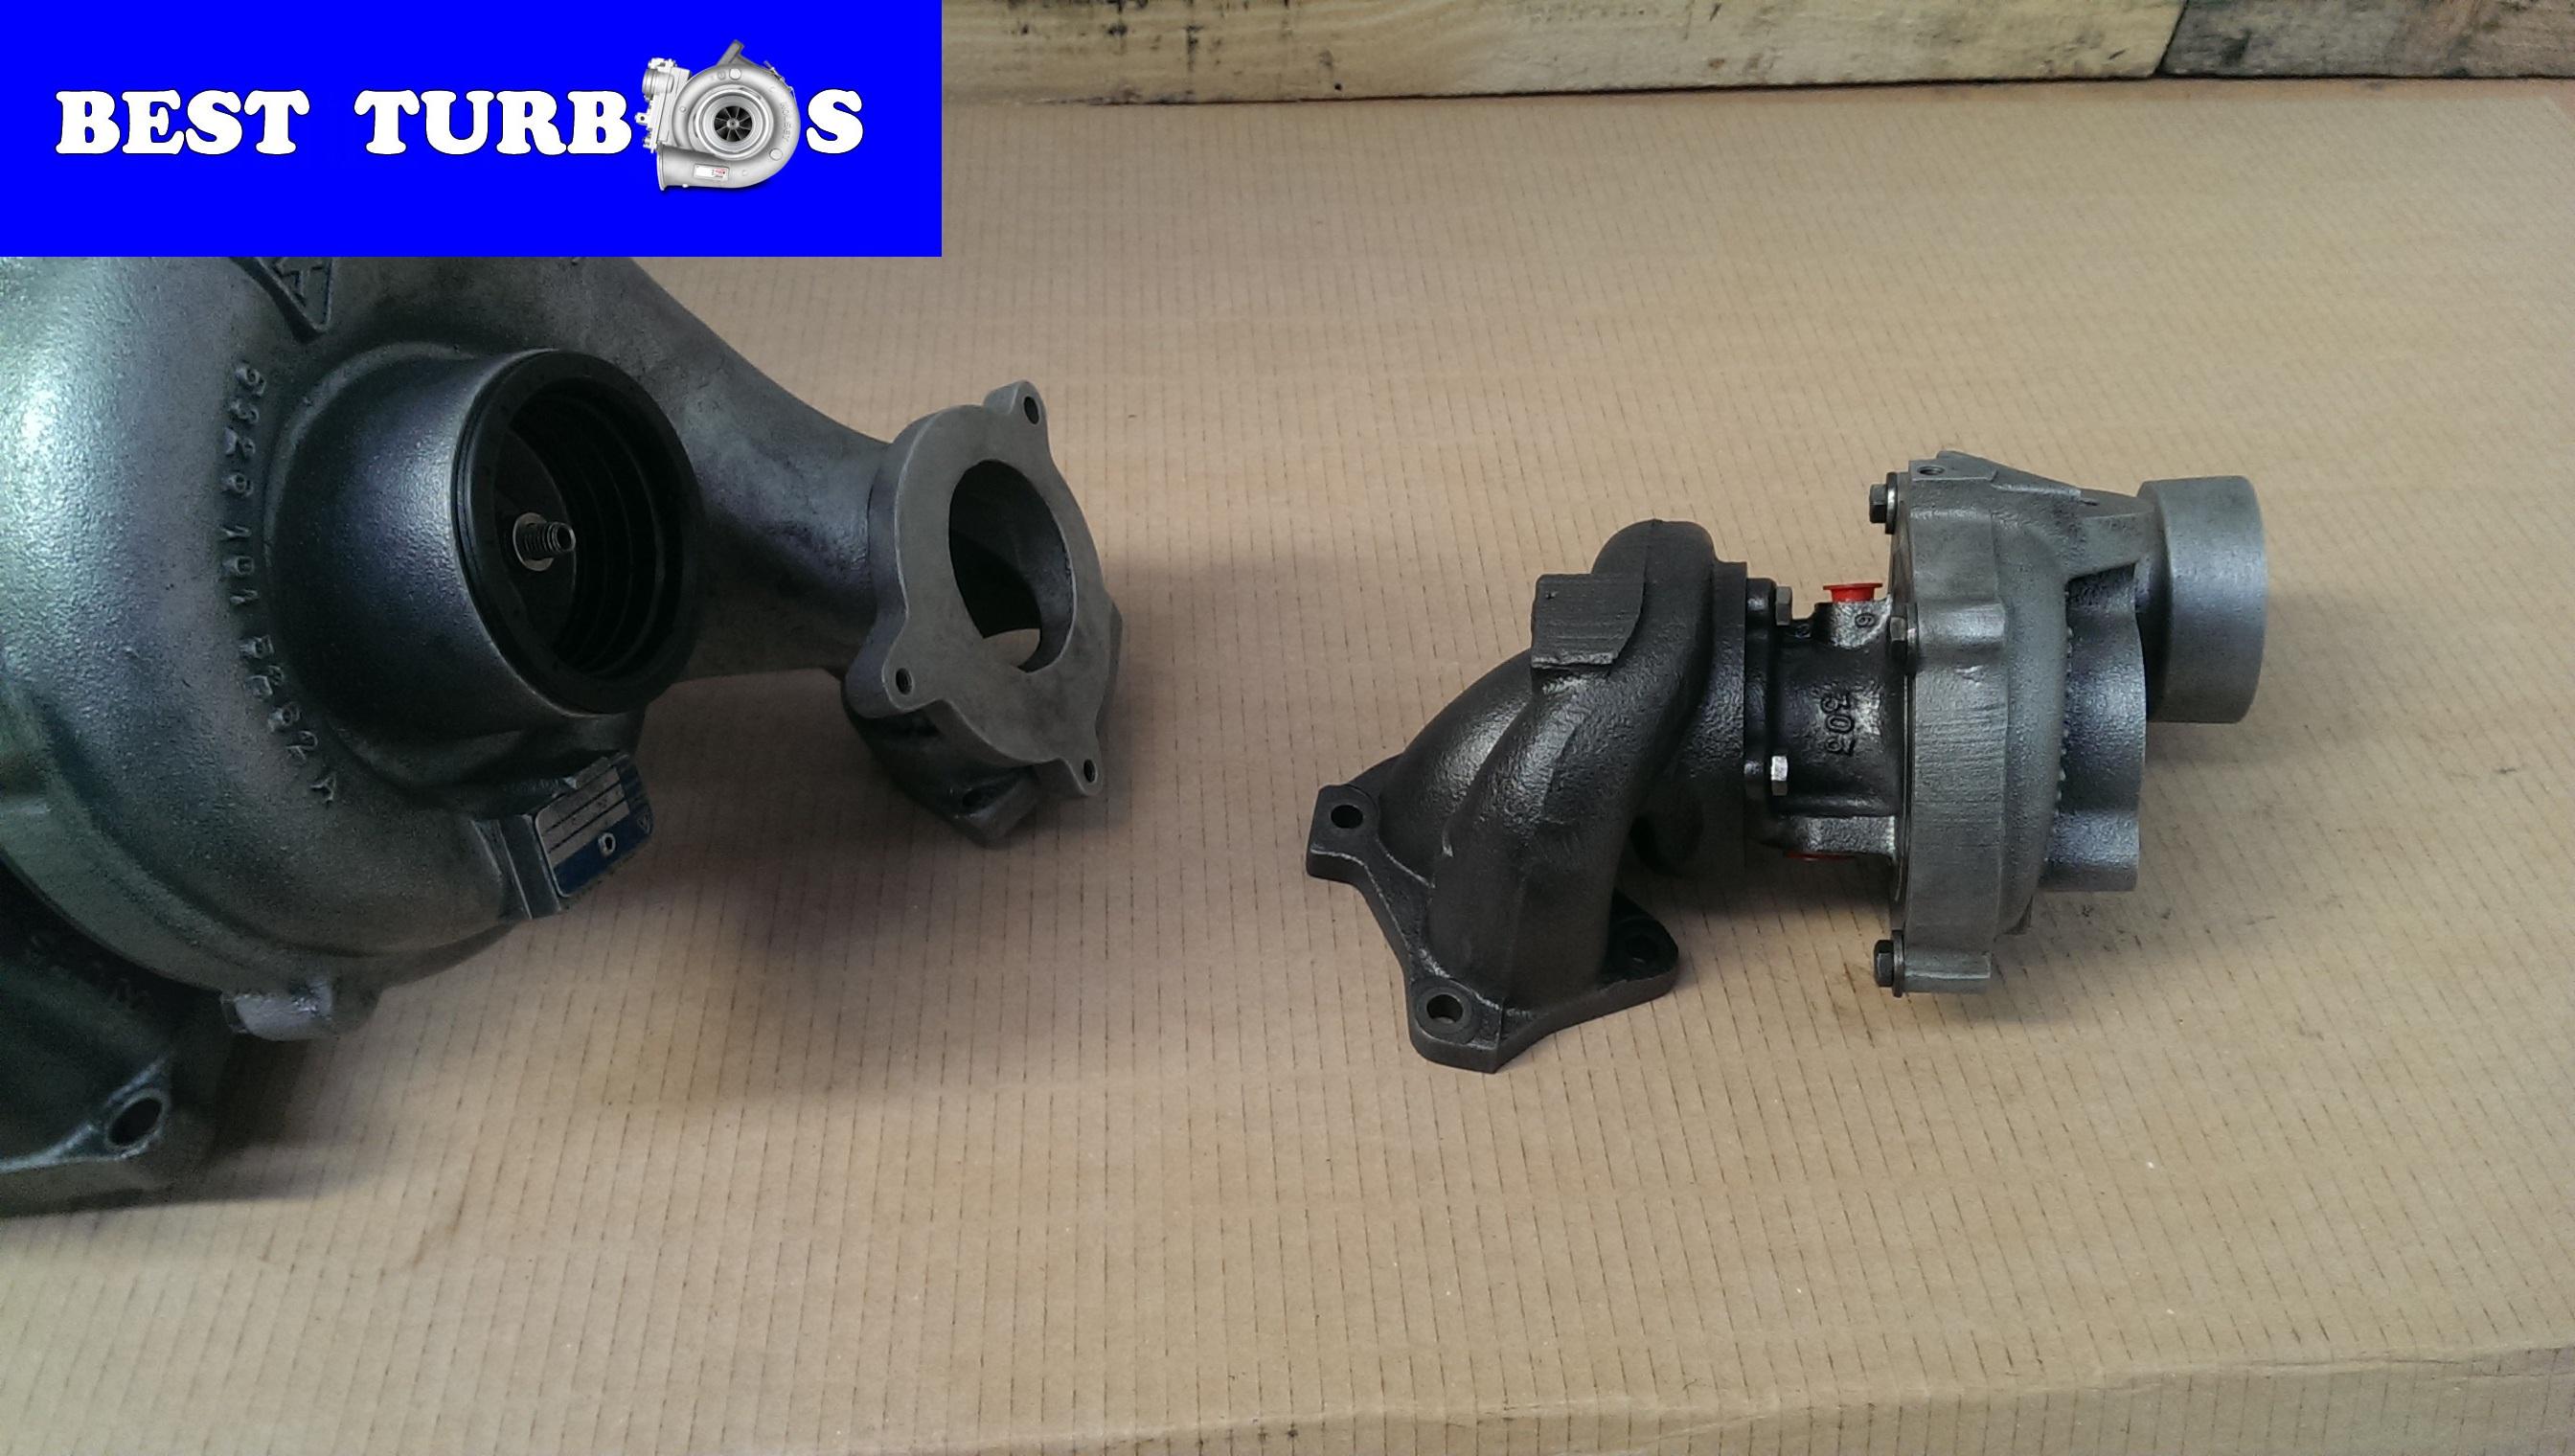 bmw bi turbo 3.0 535d 335d 535 335 turbo reconditioning  birmingham west bromwich repair refurb re manufacturing repair london west midlands essex northampton derby 53269700000 54399700045